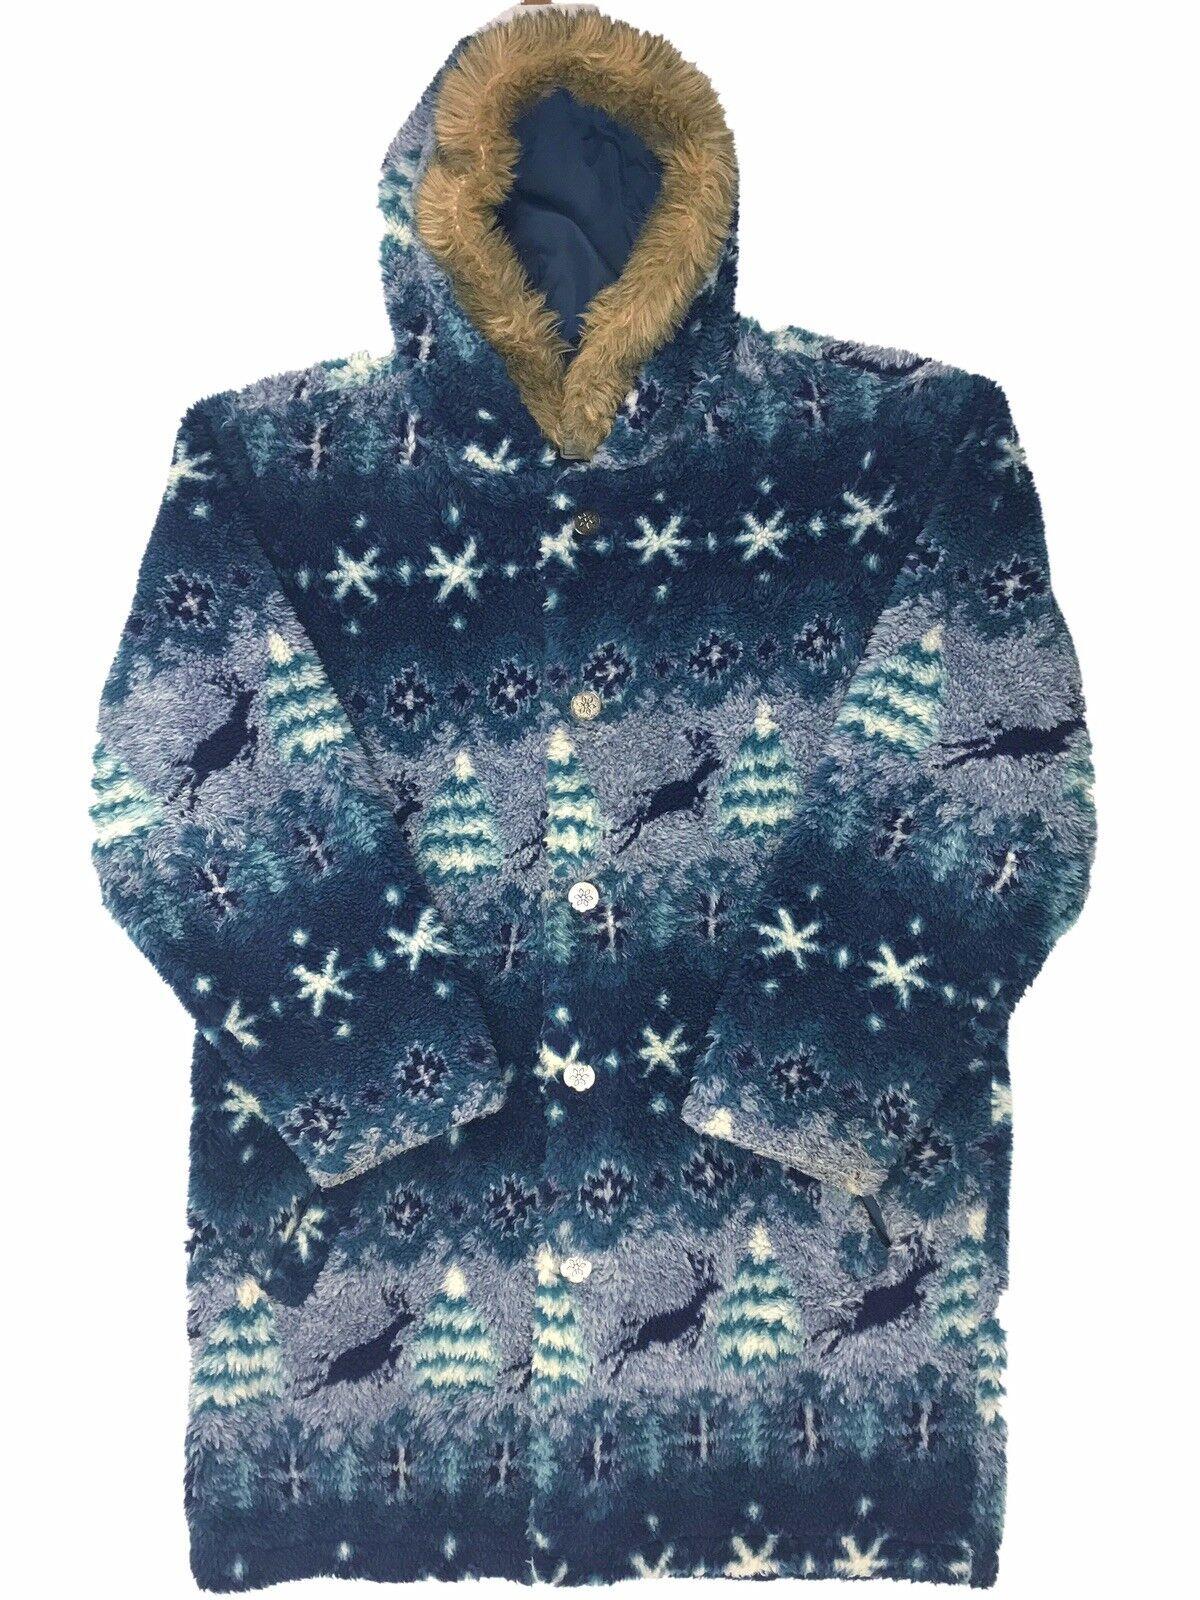 Vtg. LL Bean Mens Medium Sherpa Parka Faux Fur Hood Metal Buttons Deer Print